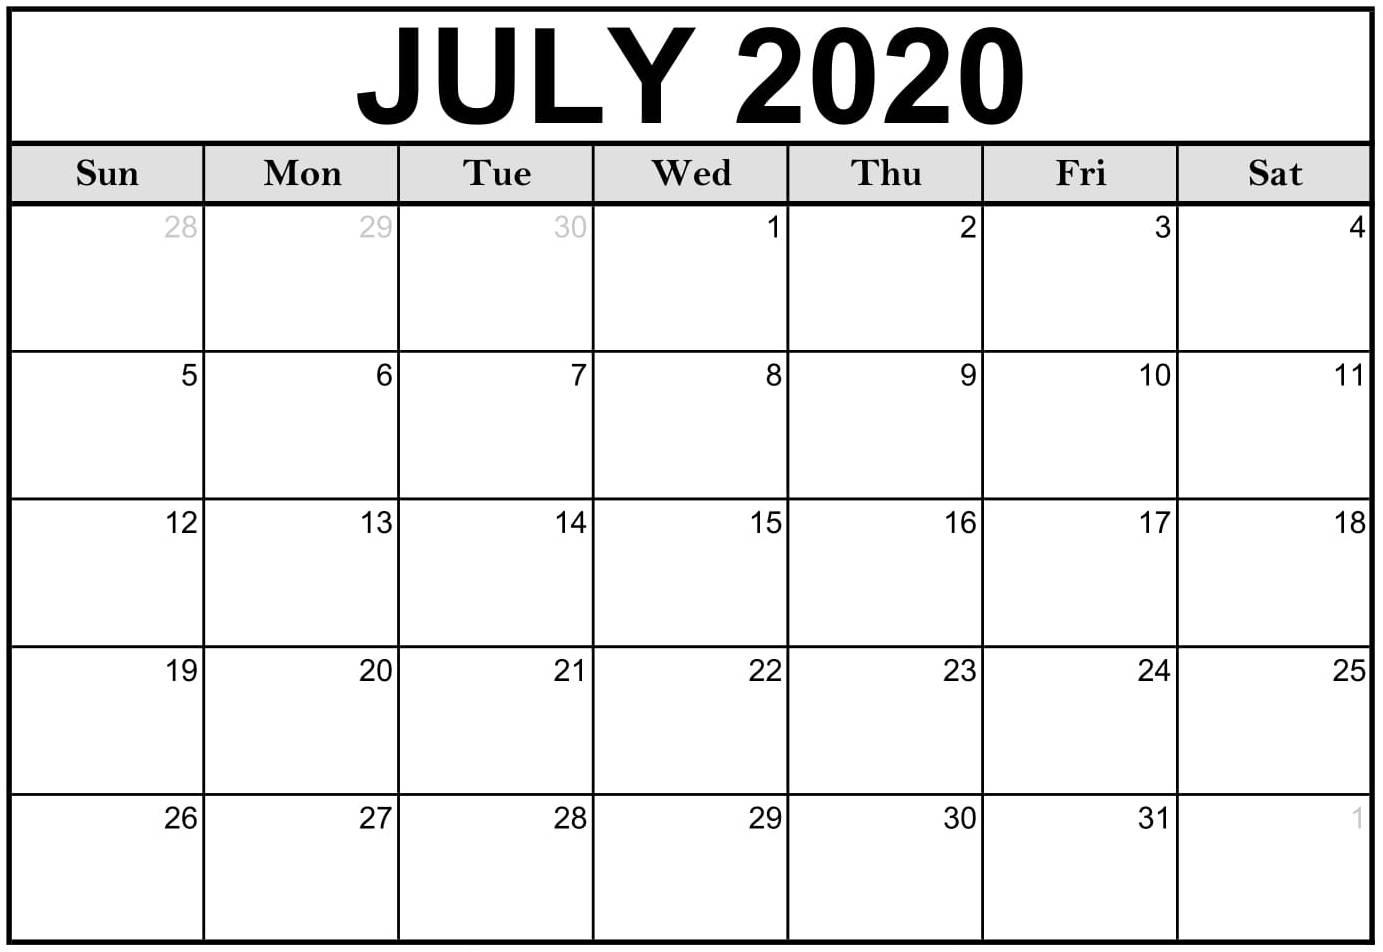 July Calendar 2020 Printable Pdf - 2019 Calendars For